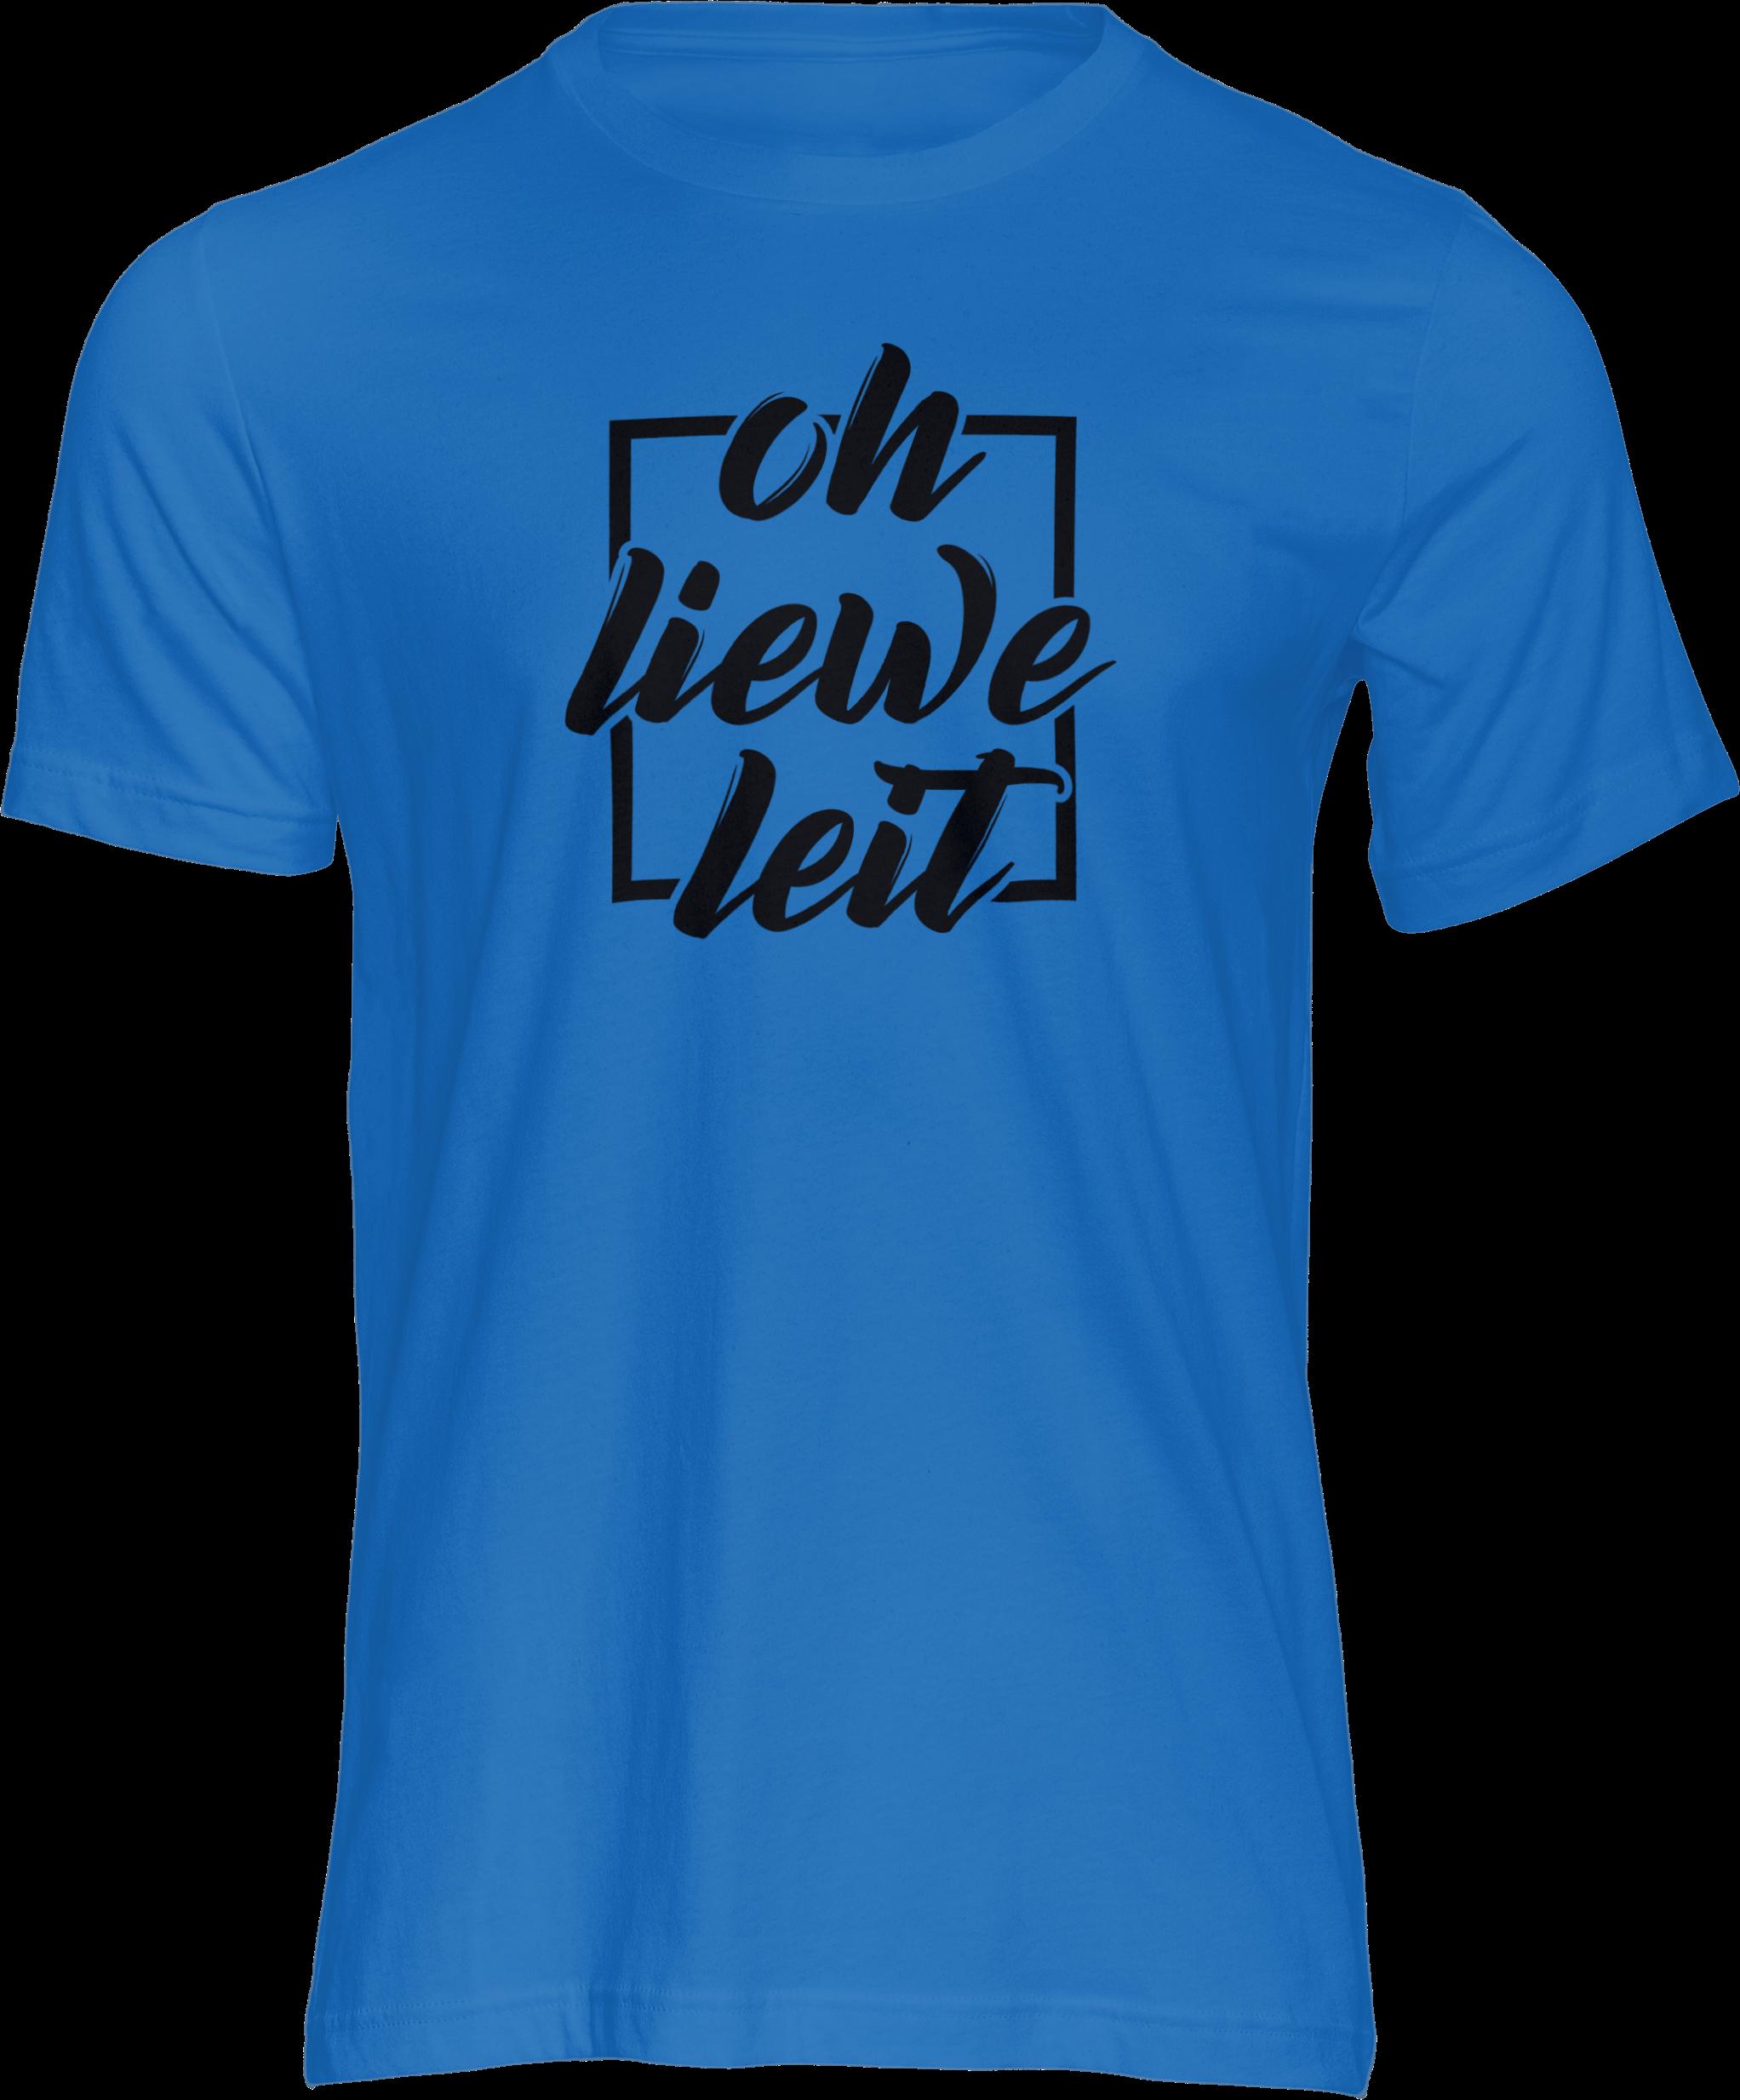 Motiv-Shirt – Oh liewe Leit – T-Shirt (blau)